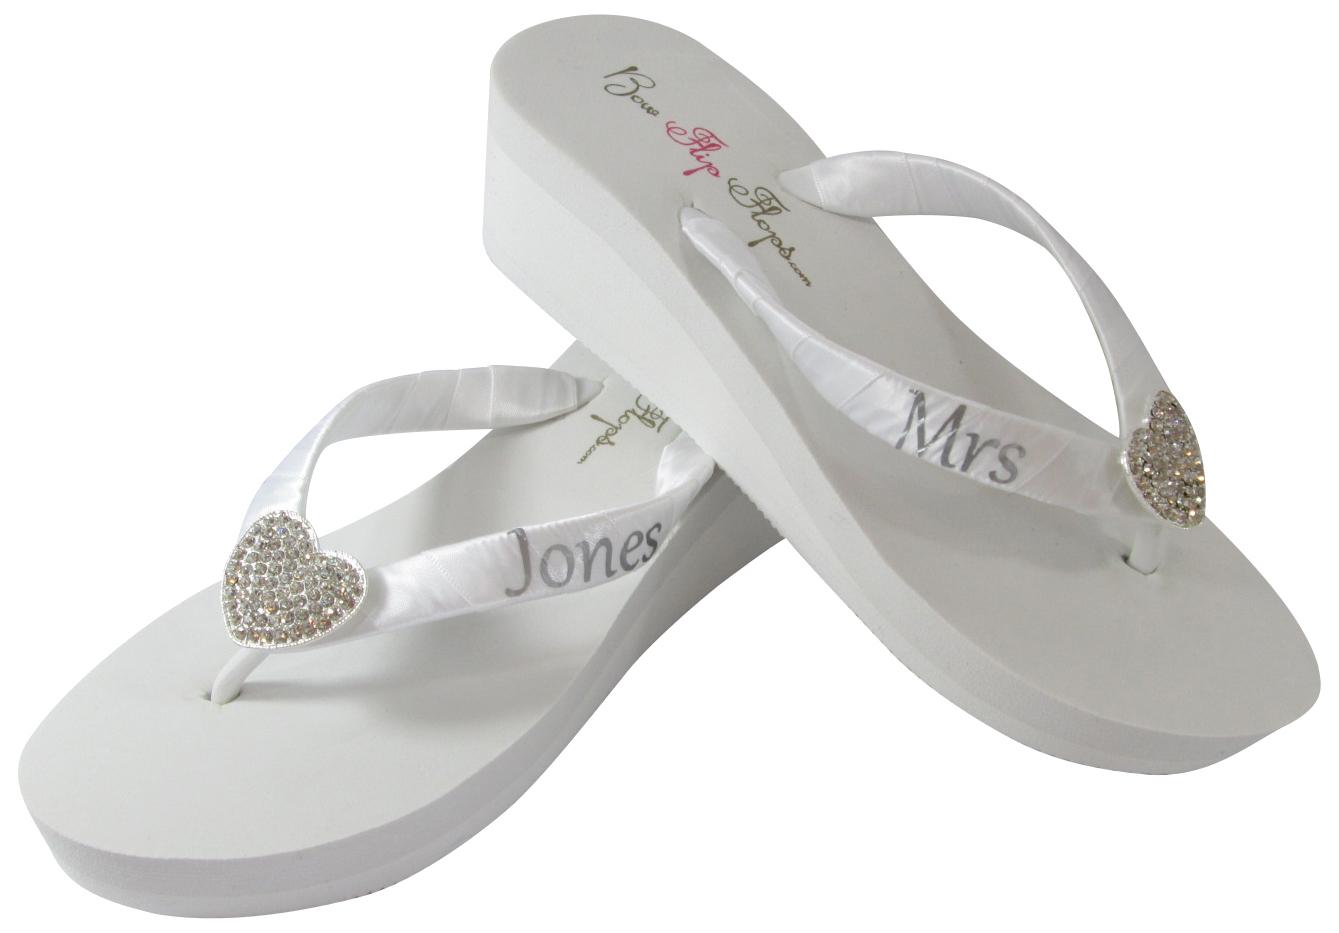 e1ce91c6e5b72 Emerald Cut Bridal Personalized Bling Flip and 10 similar items